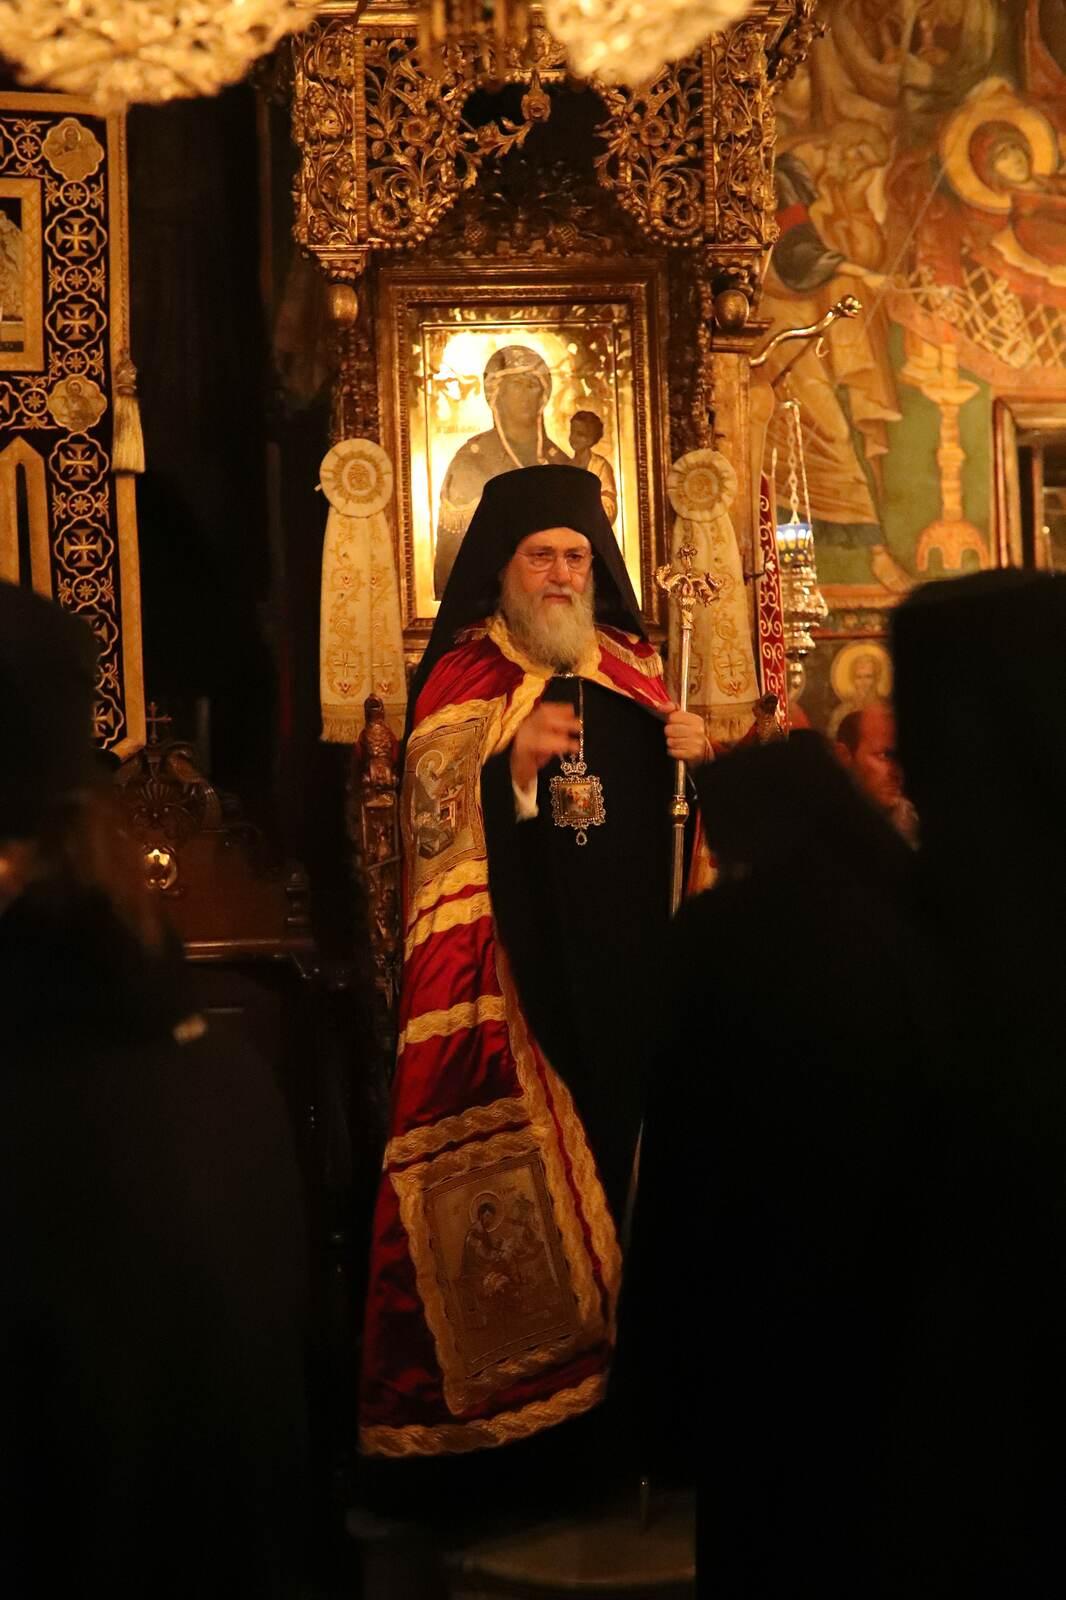 miracles - Ascetic Experience, Vatopaidi (Vatopedi), Mount Athos, Holy Mountain